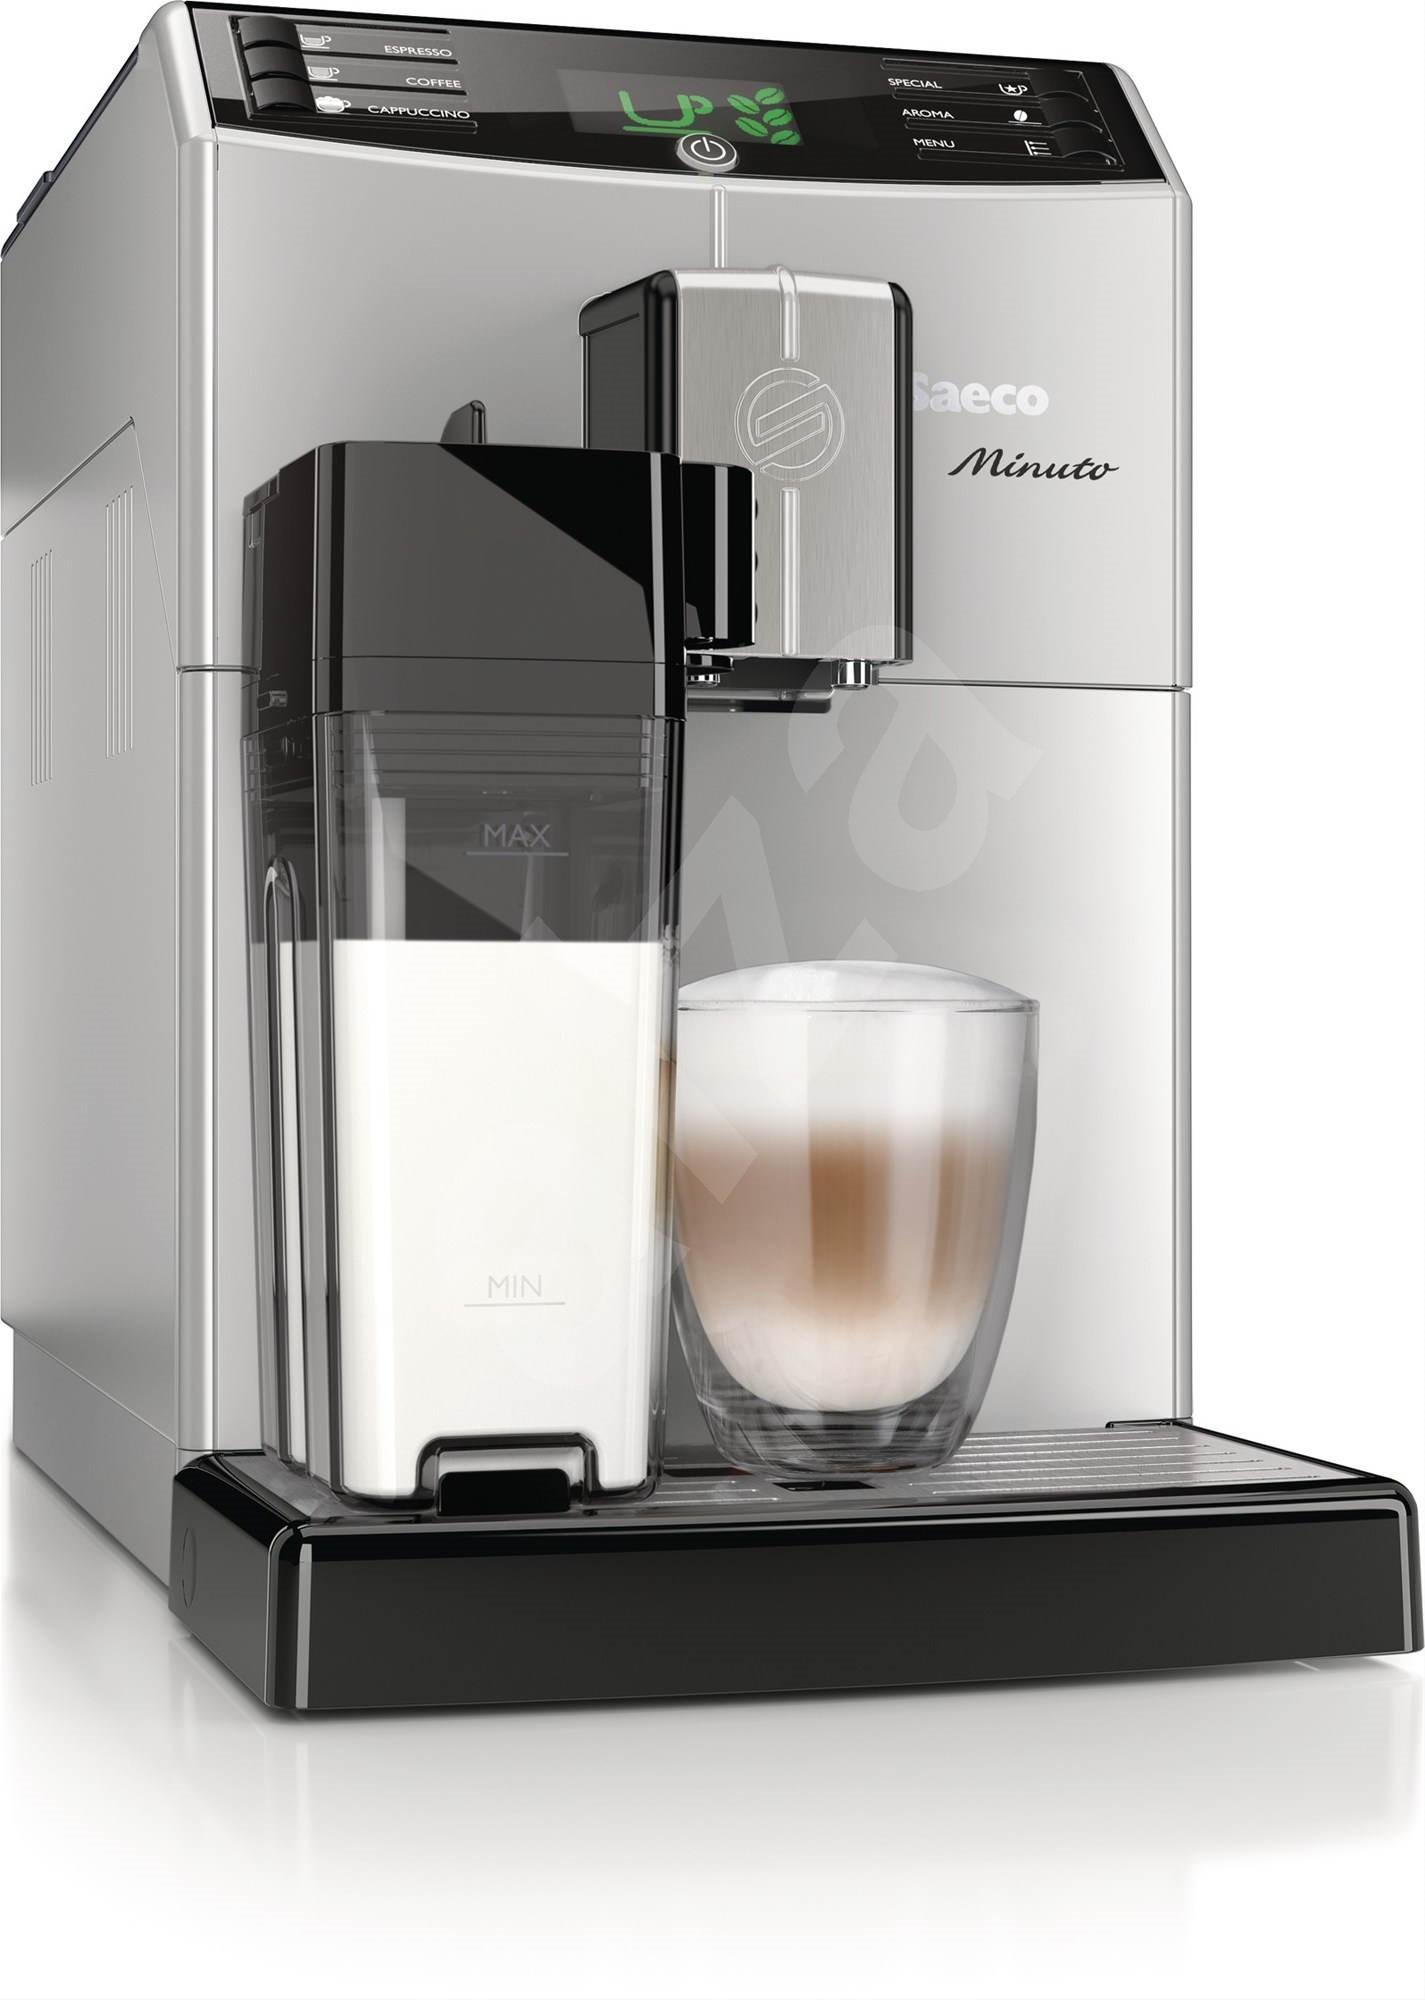 philips saeco hd8763 19 minuto one espresso machine. Black Bedroom Furniture Sets. Home Design Ideas